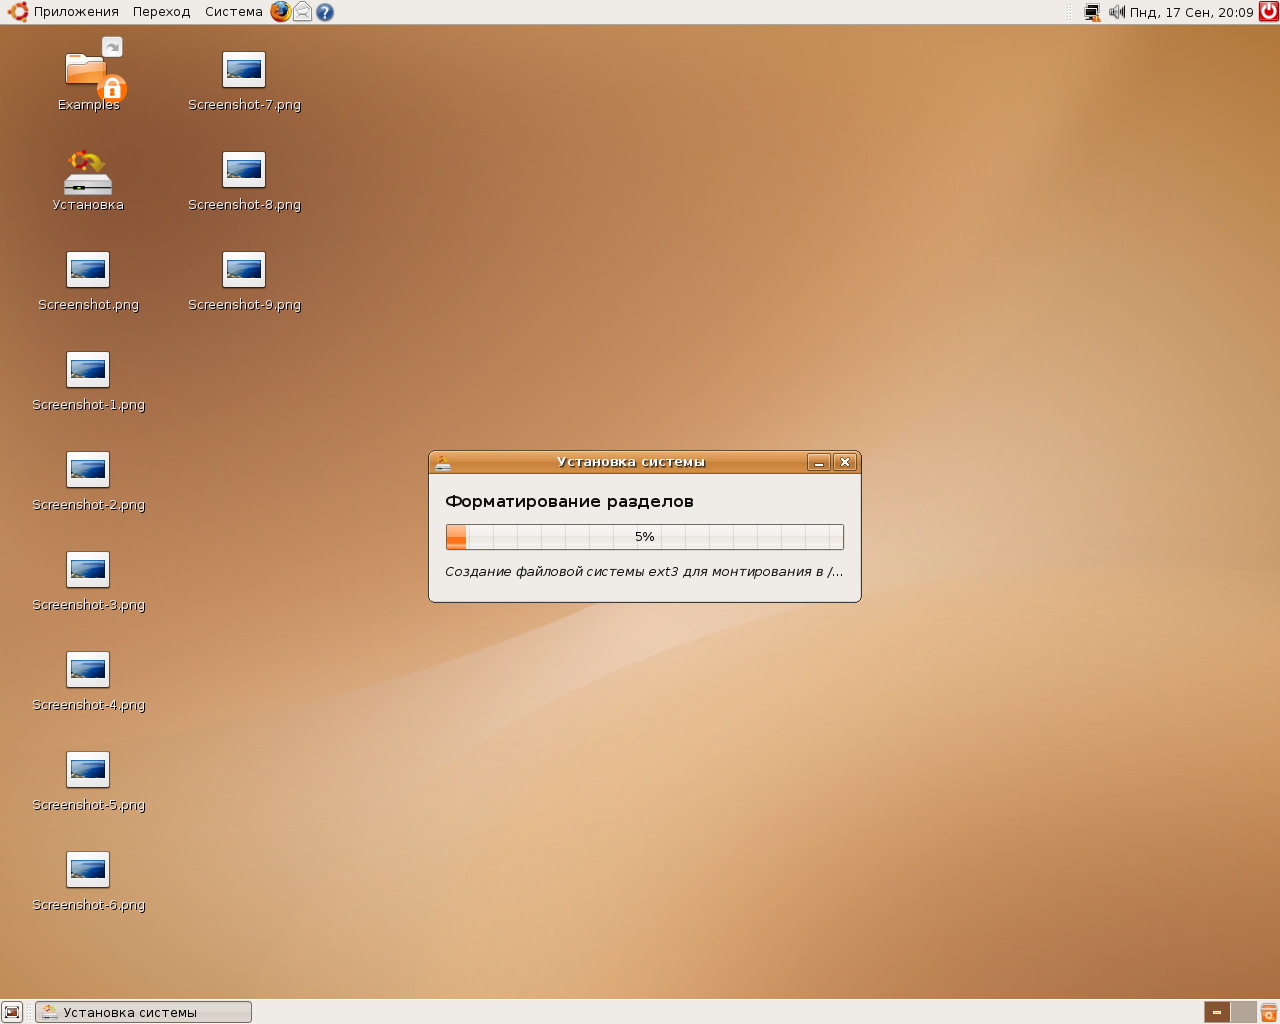 Запись загрузочного диска windows xp